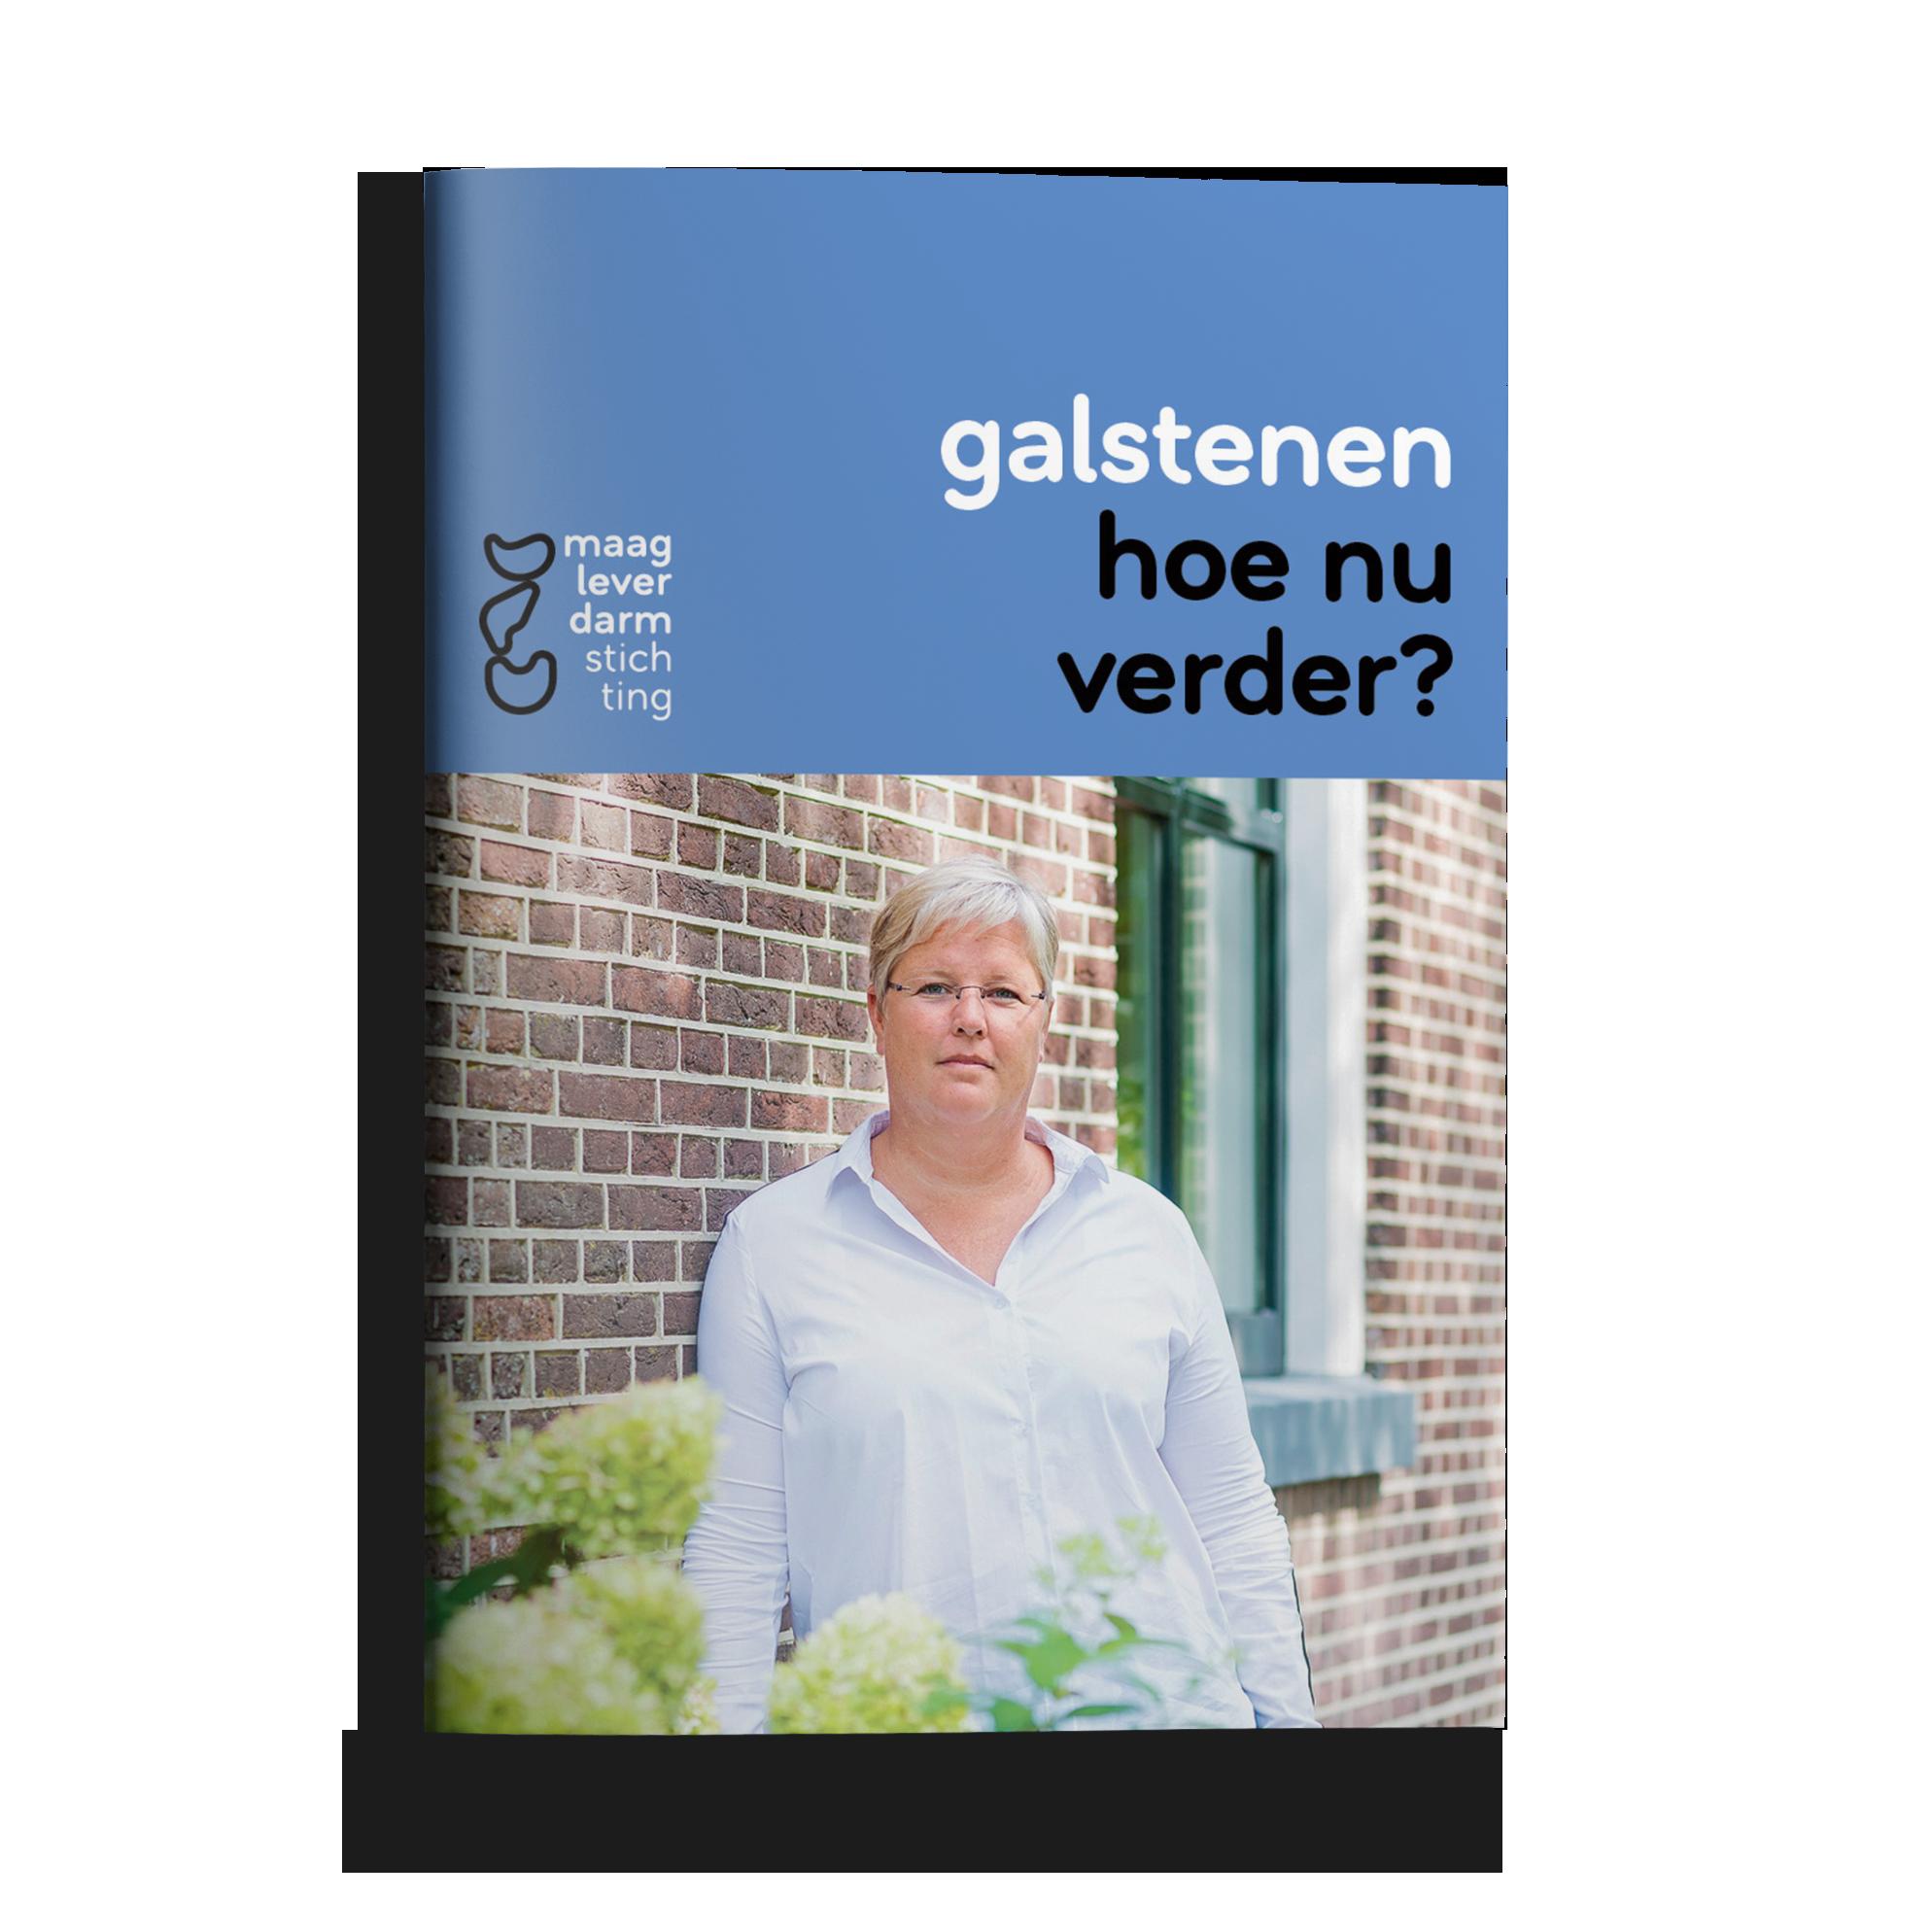 https://www.mlds.nl/content/uploads/2020/08/MLDS_Brochure_Galstenen_Online_Mockup.png